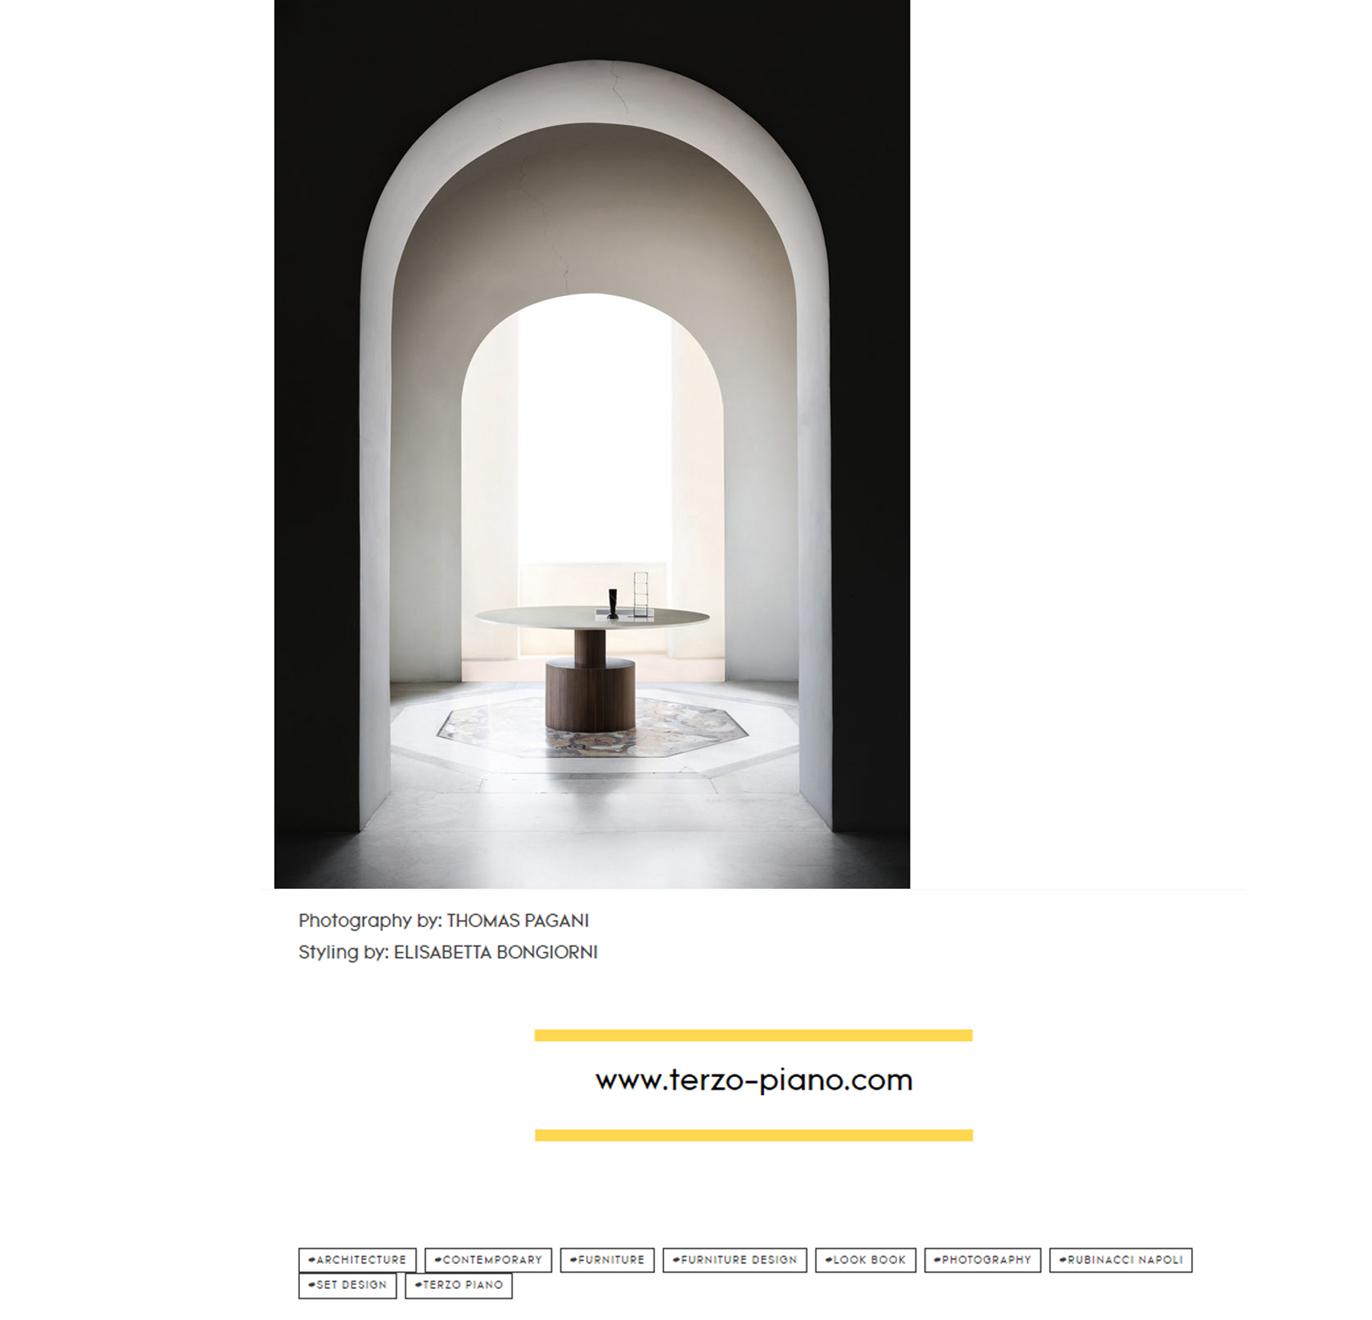 Trendland - Rubinacci styled by Terzo Piano